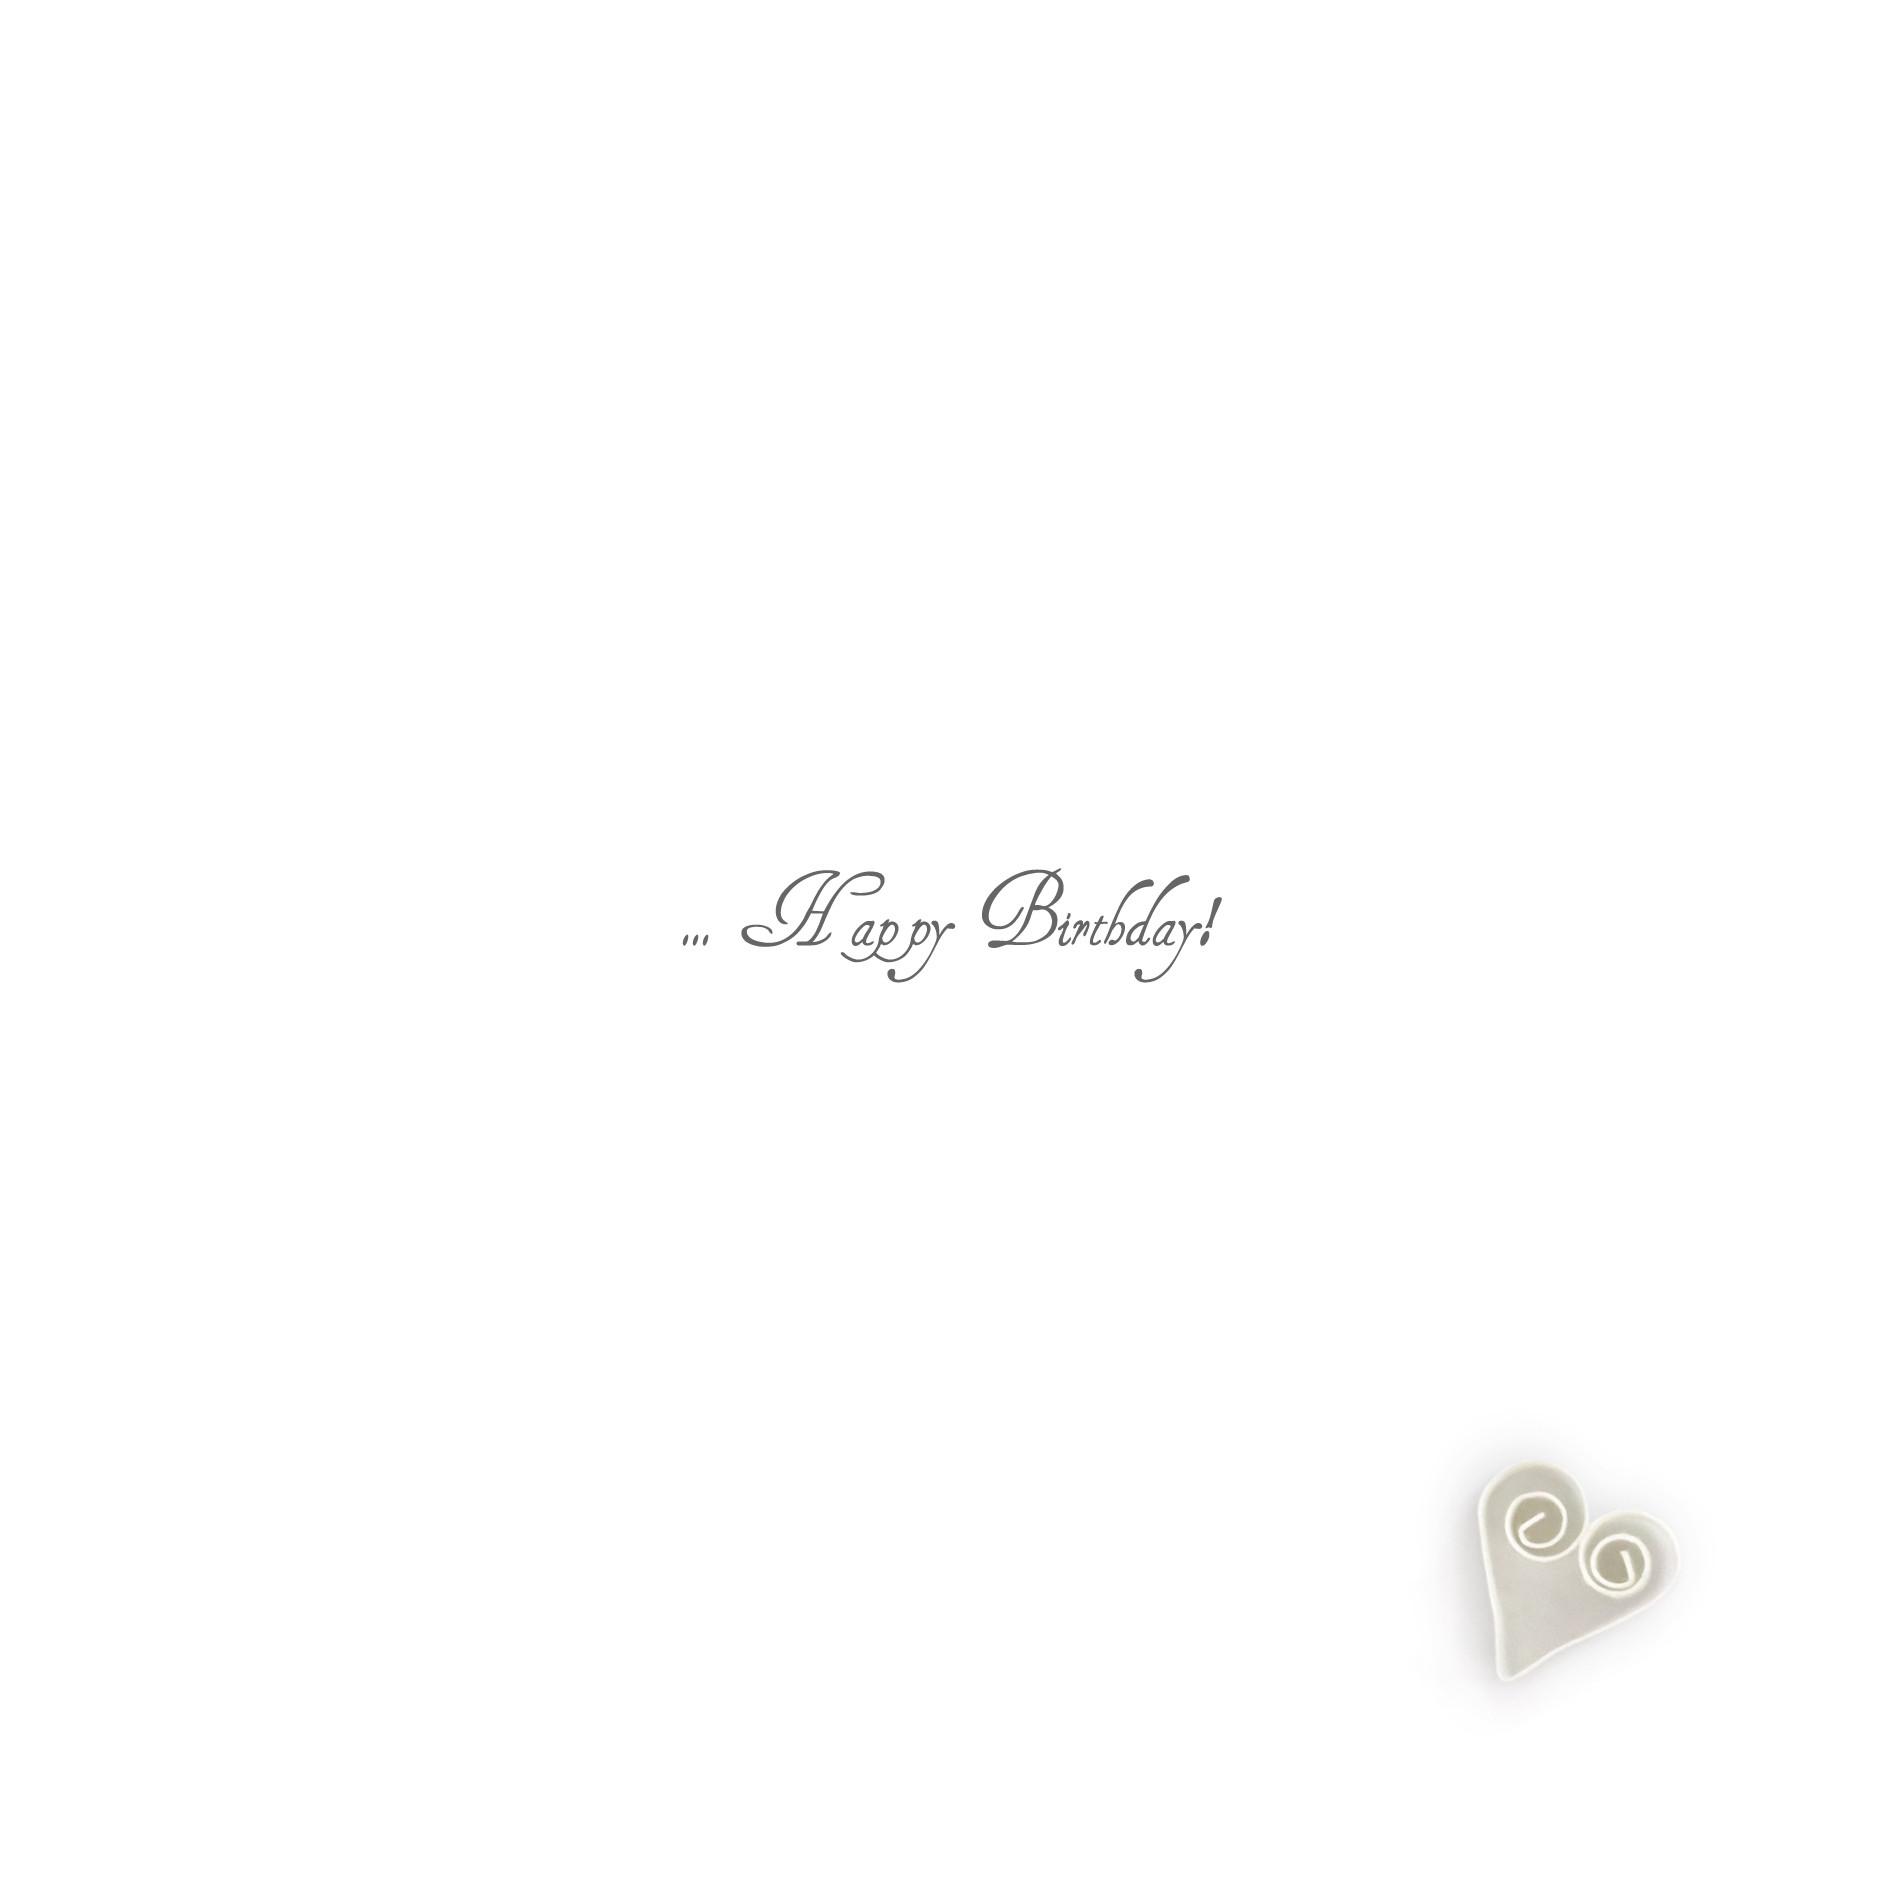 Ciara Fawn 'Paper world' range - inside